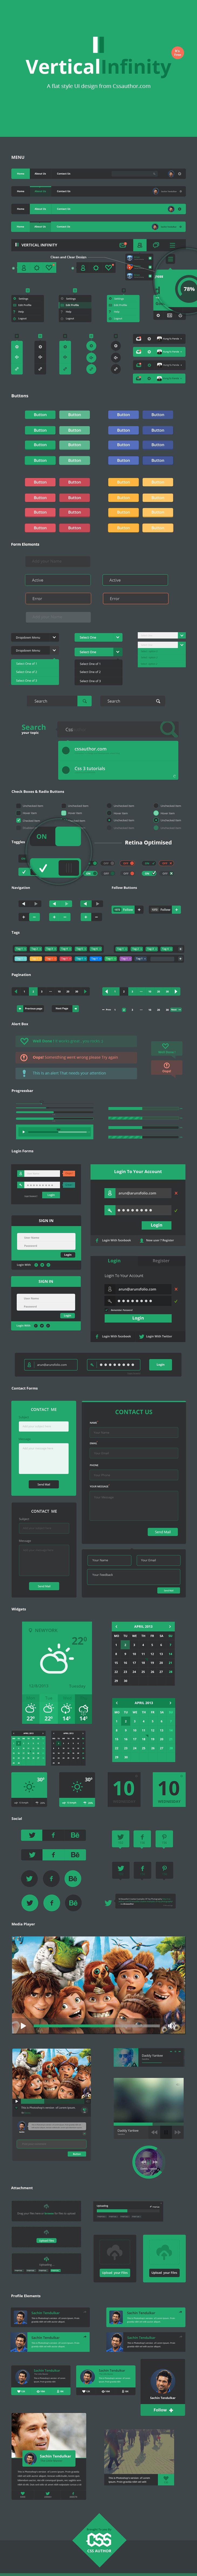 Vertical Infinity - A Mega Flat Style UI Kit - Freebies - Fribly #grafica #web